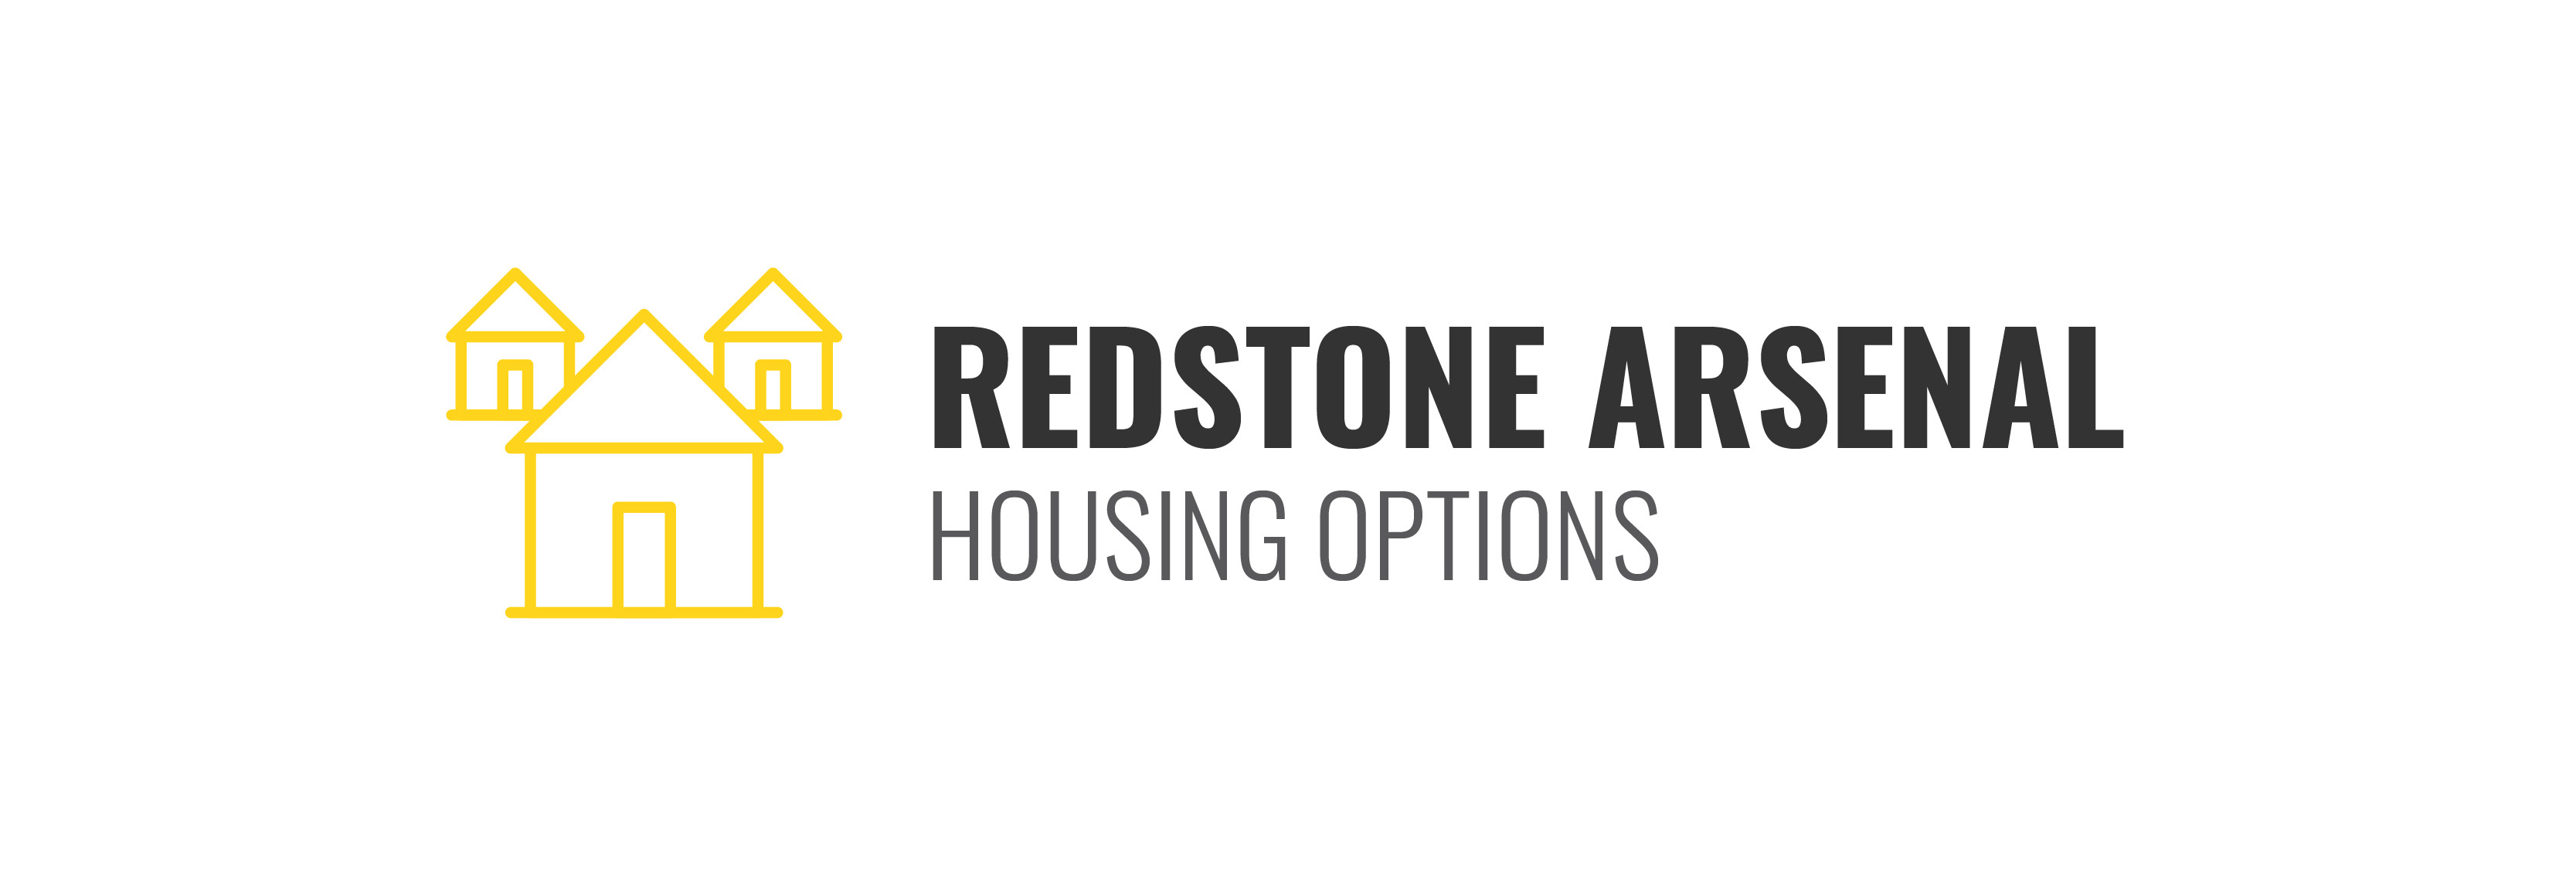 Redstone Arsenal Housing Options